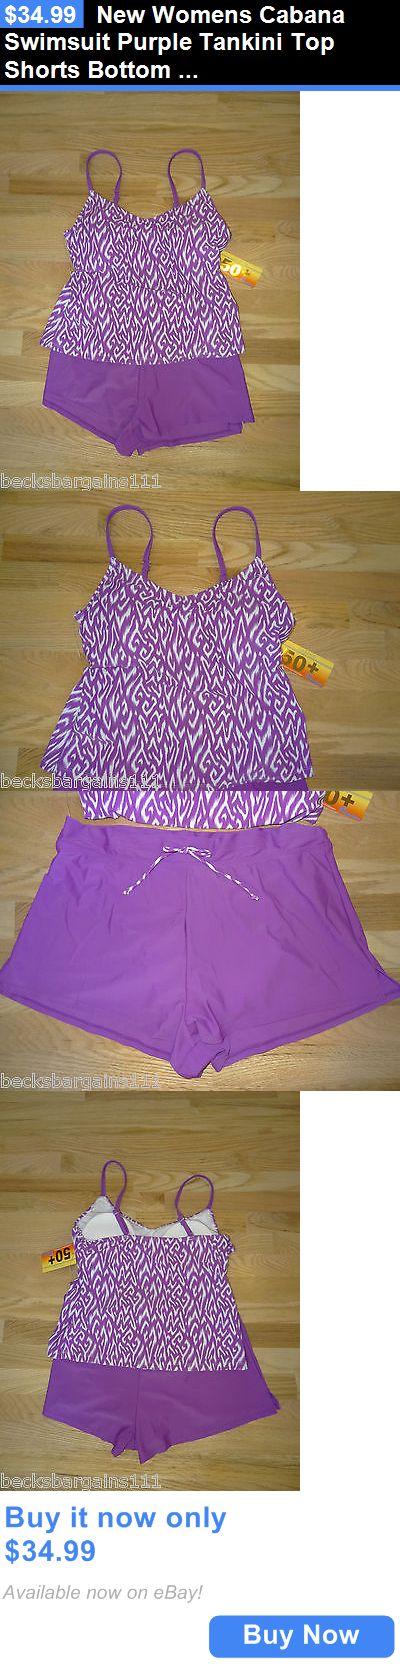 Women Swimwear: New Womens Cabana Swimsuit Purple Tankini Top Shorts Bottom Large 14 Nwt BUY IT NOW ONLY: $34.99